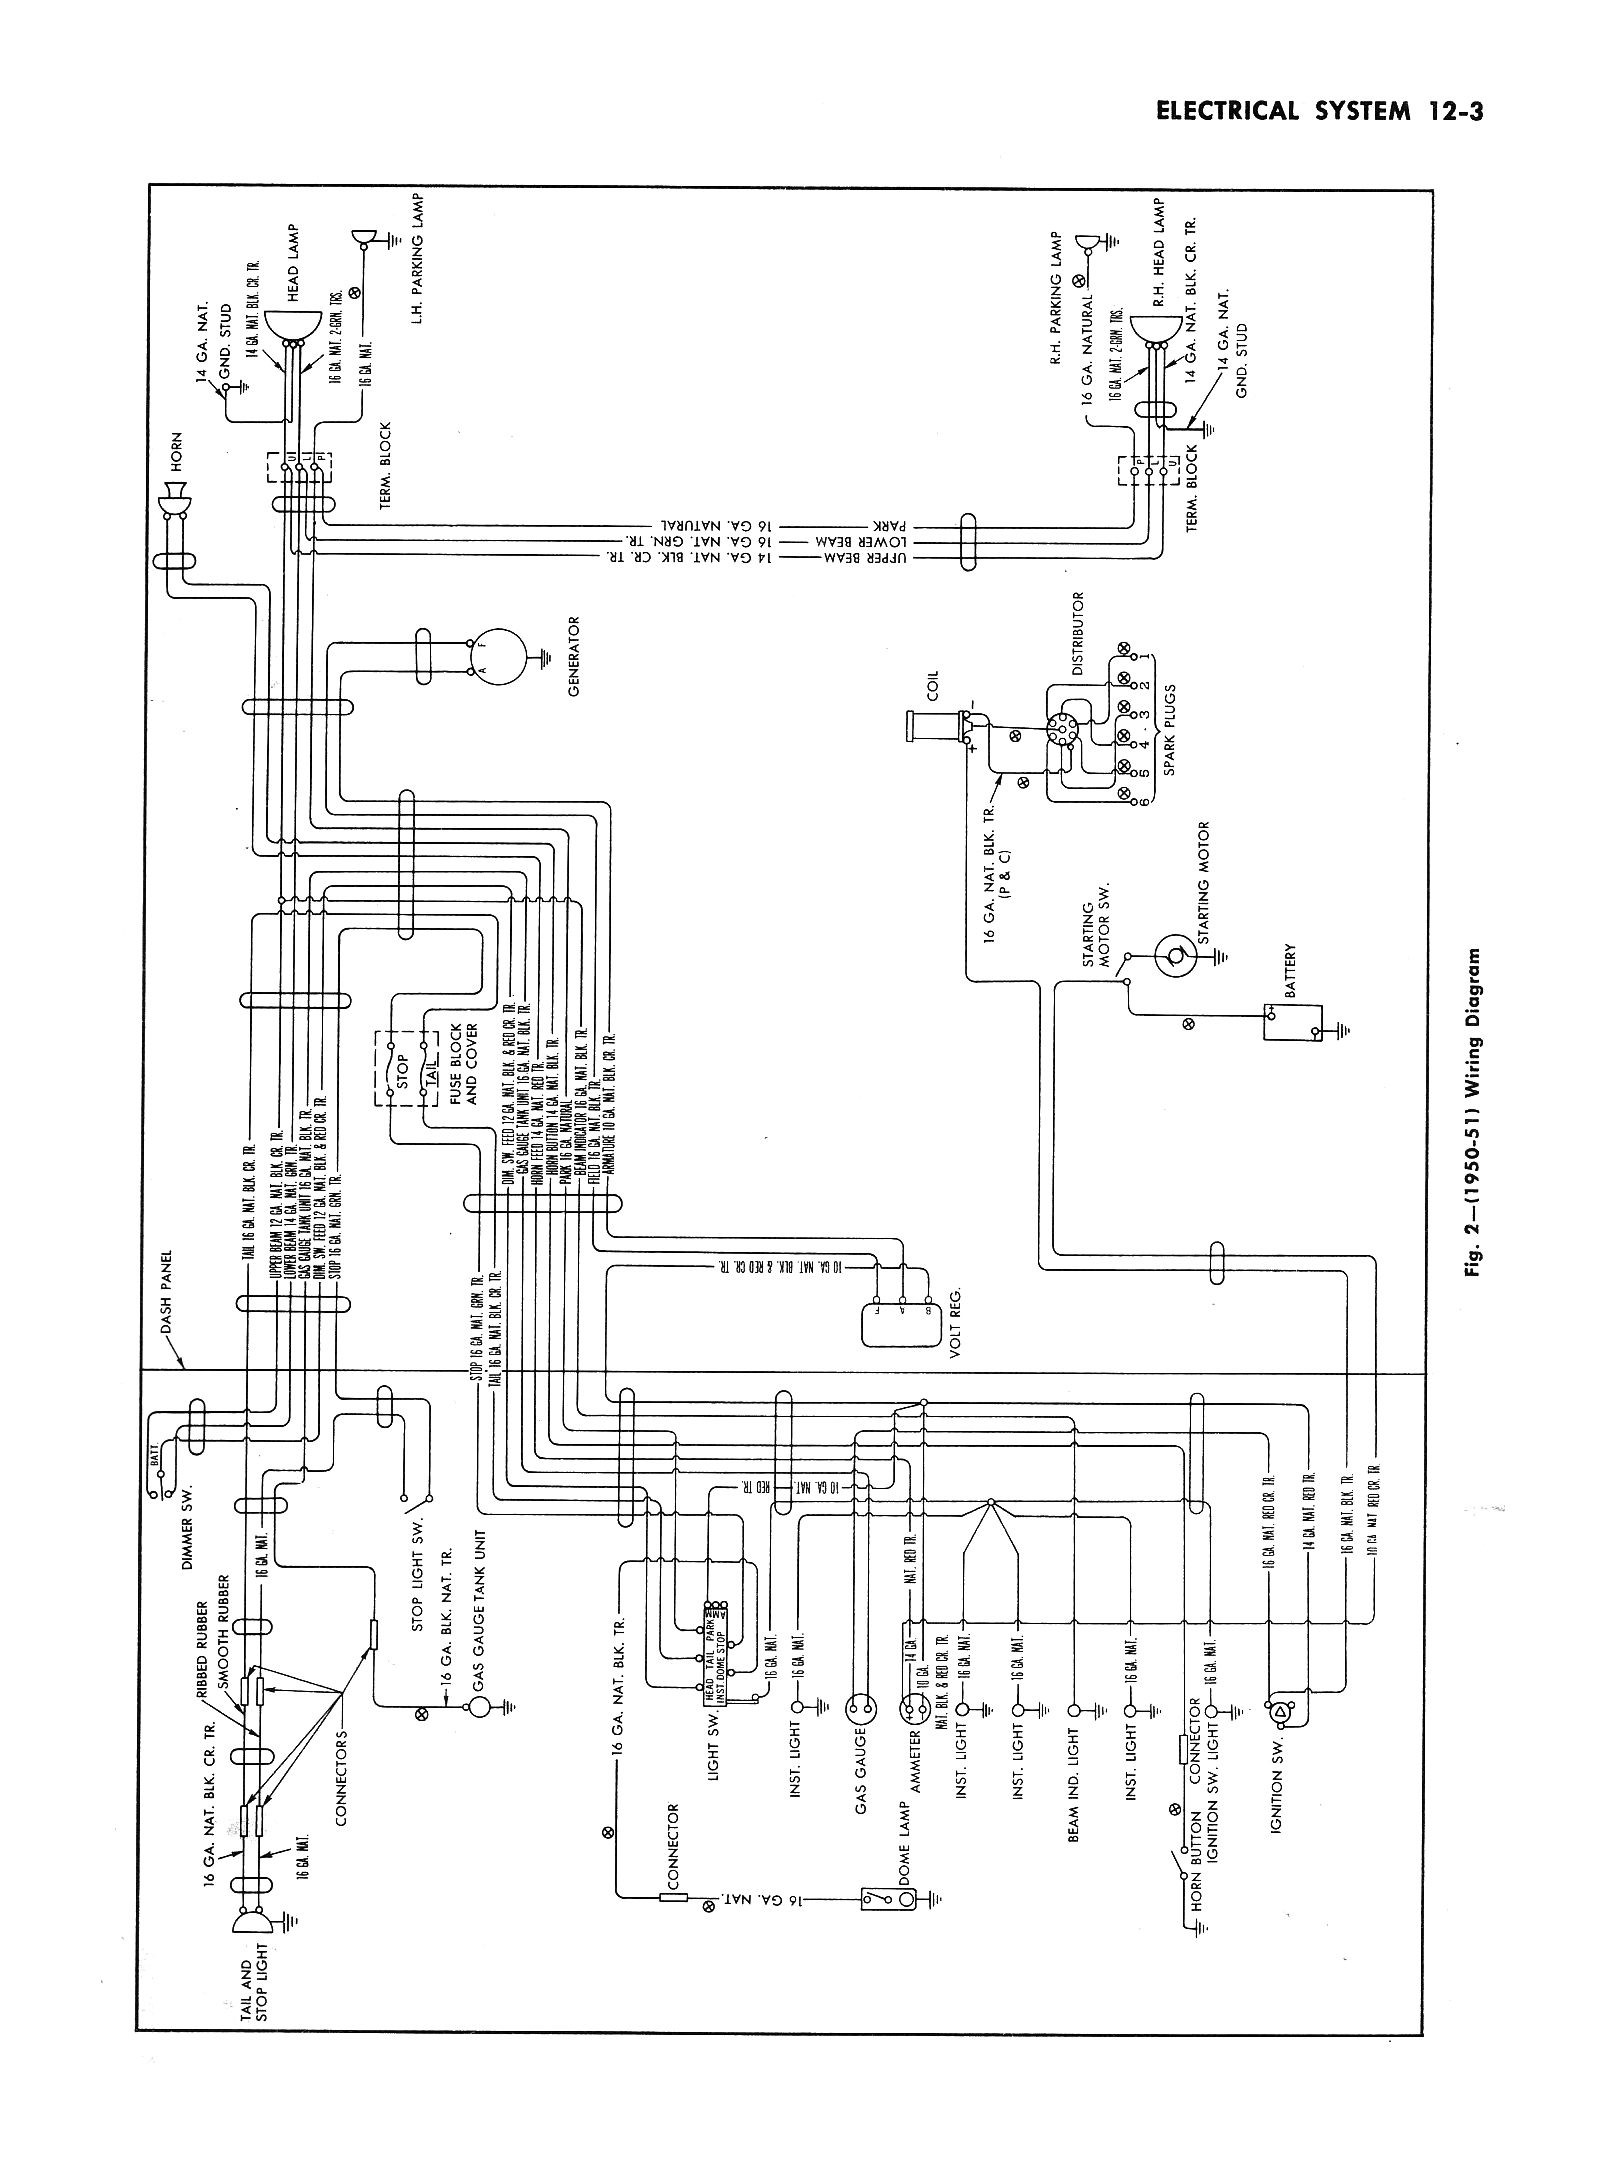 Wiring Diagram for Refrigerator Detroit Diesel Fan Clutch Wiring Diagram Navistar Wiring Diagrams Of Wiring Diagram for Refrigerator